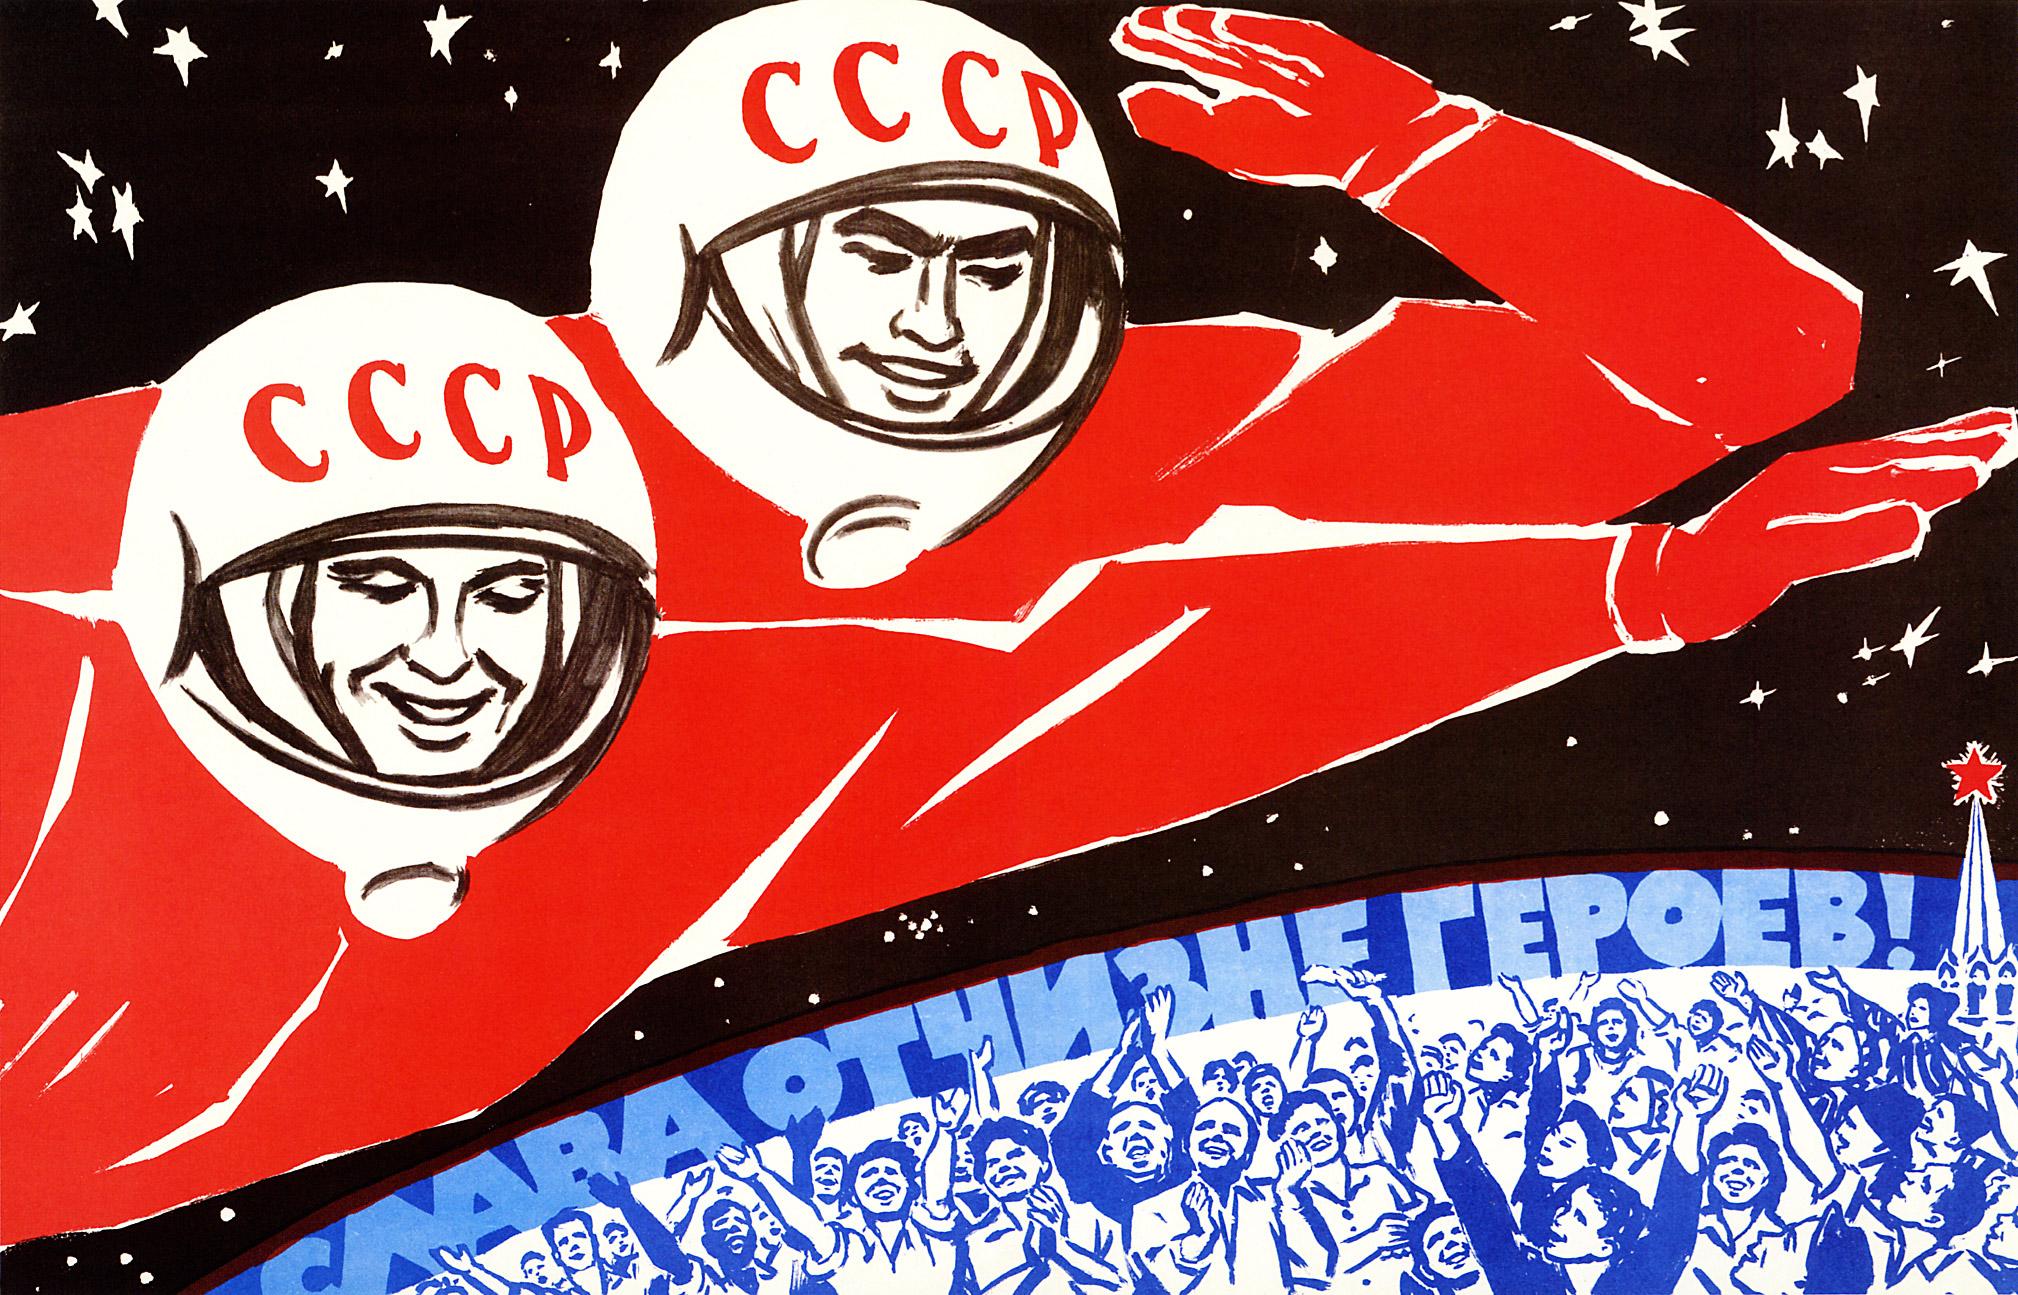 Sticker risitas urss espace fusee science communisme fi